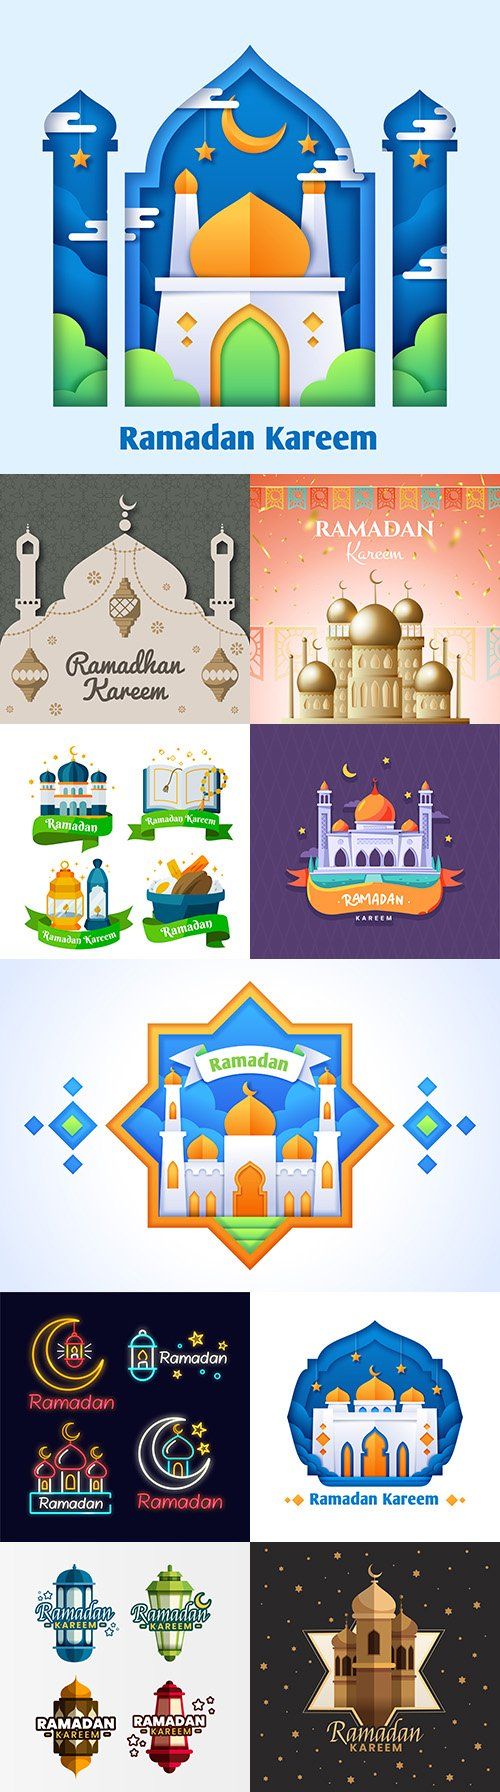 Ramadan Kareem design illustrations in flat style